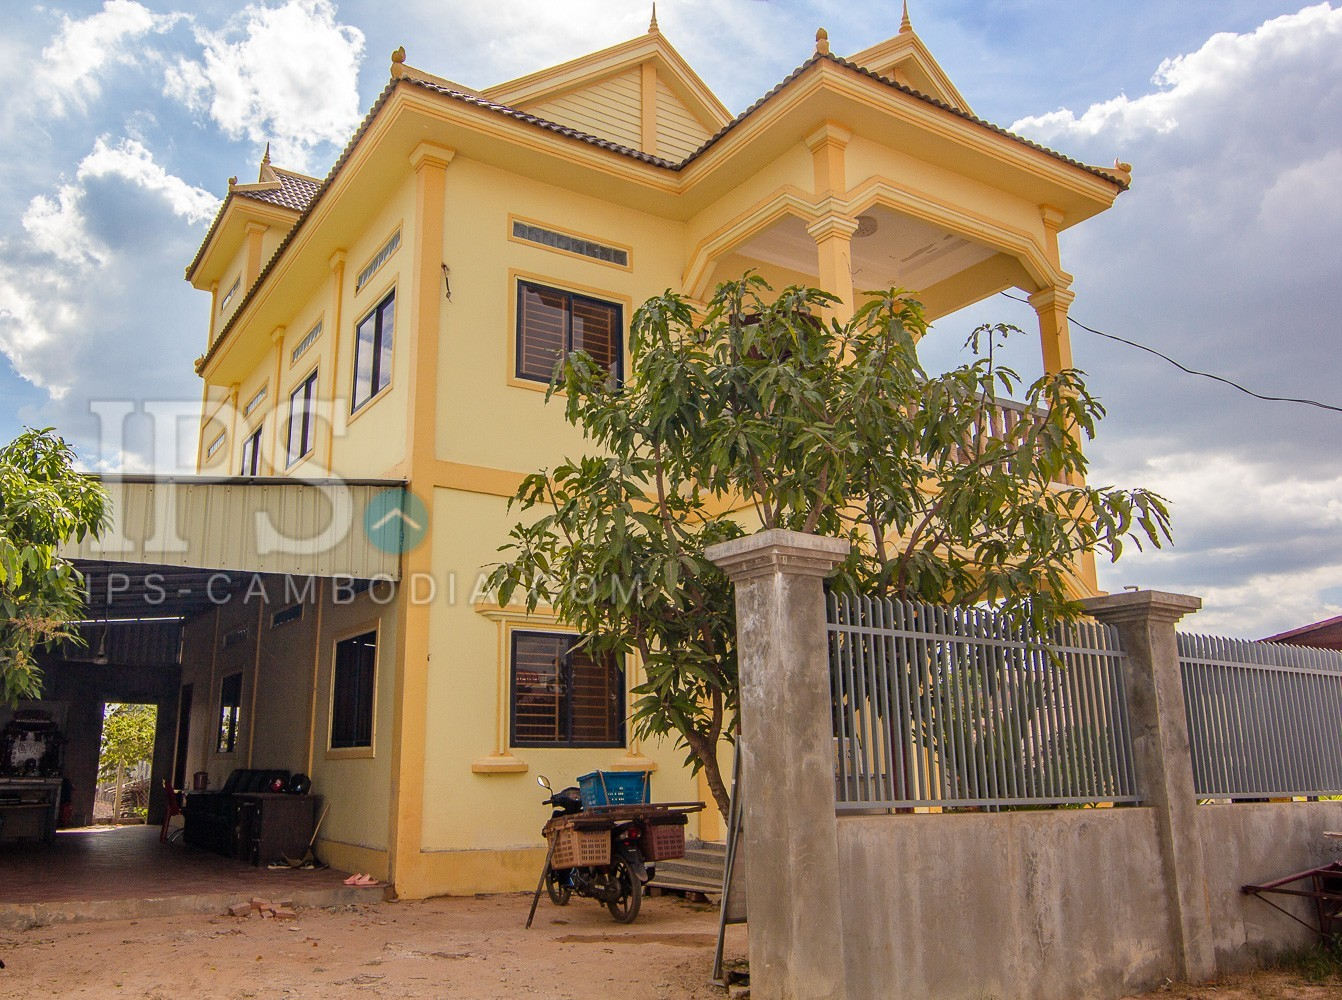 5 Bedroom House For Sale - Sangkat Siem Reap, Siem Reap